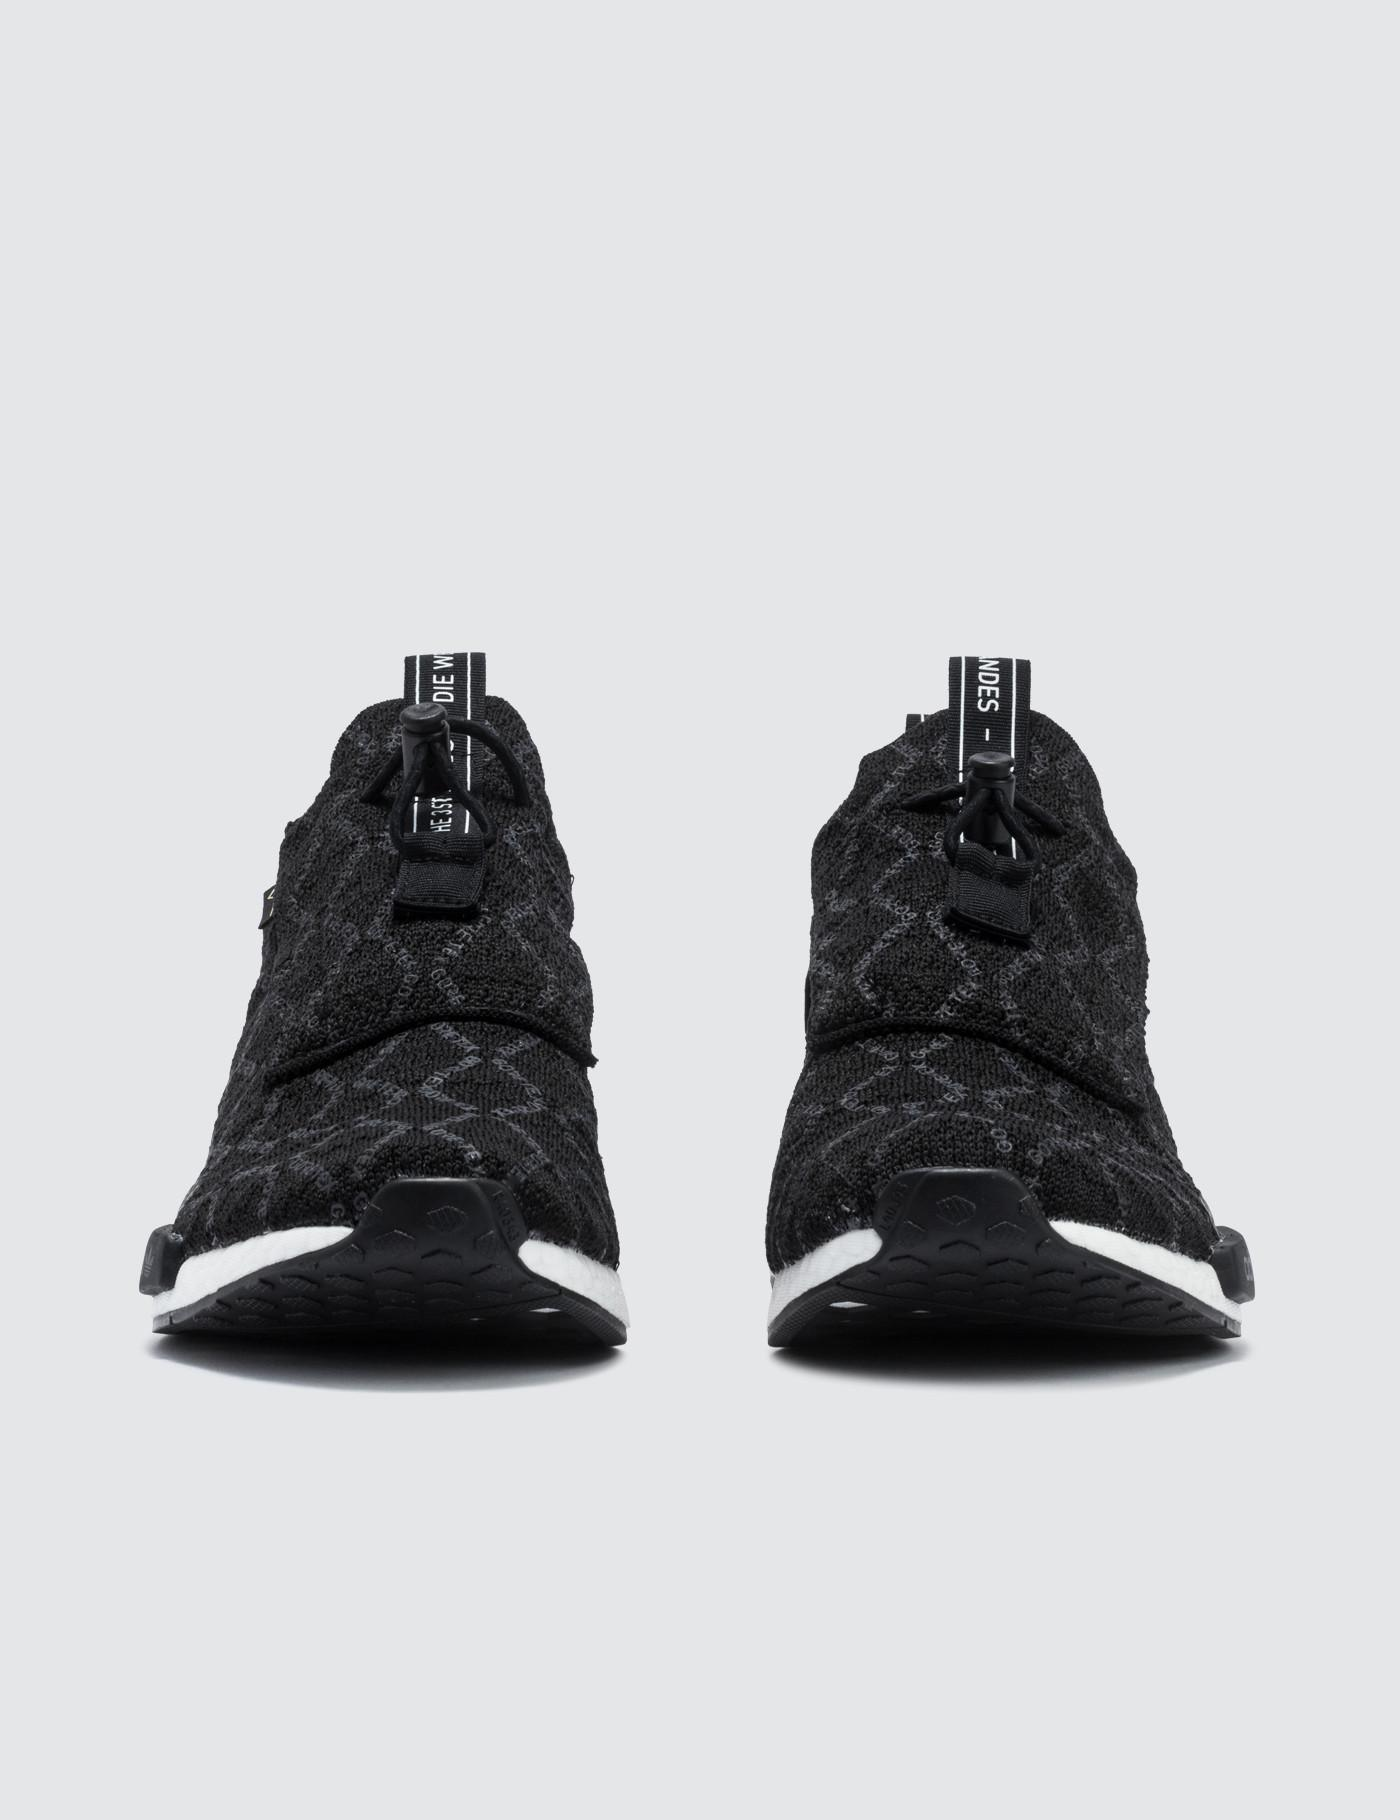 06507359979c2 Lyst - adidas Originals Nmd Ts1 Gtx Primeknit in Black for Men